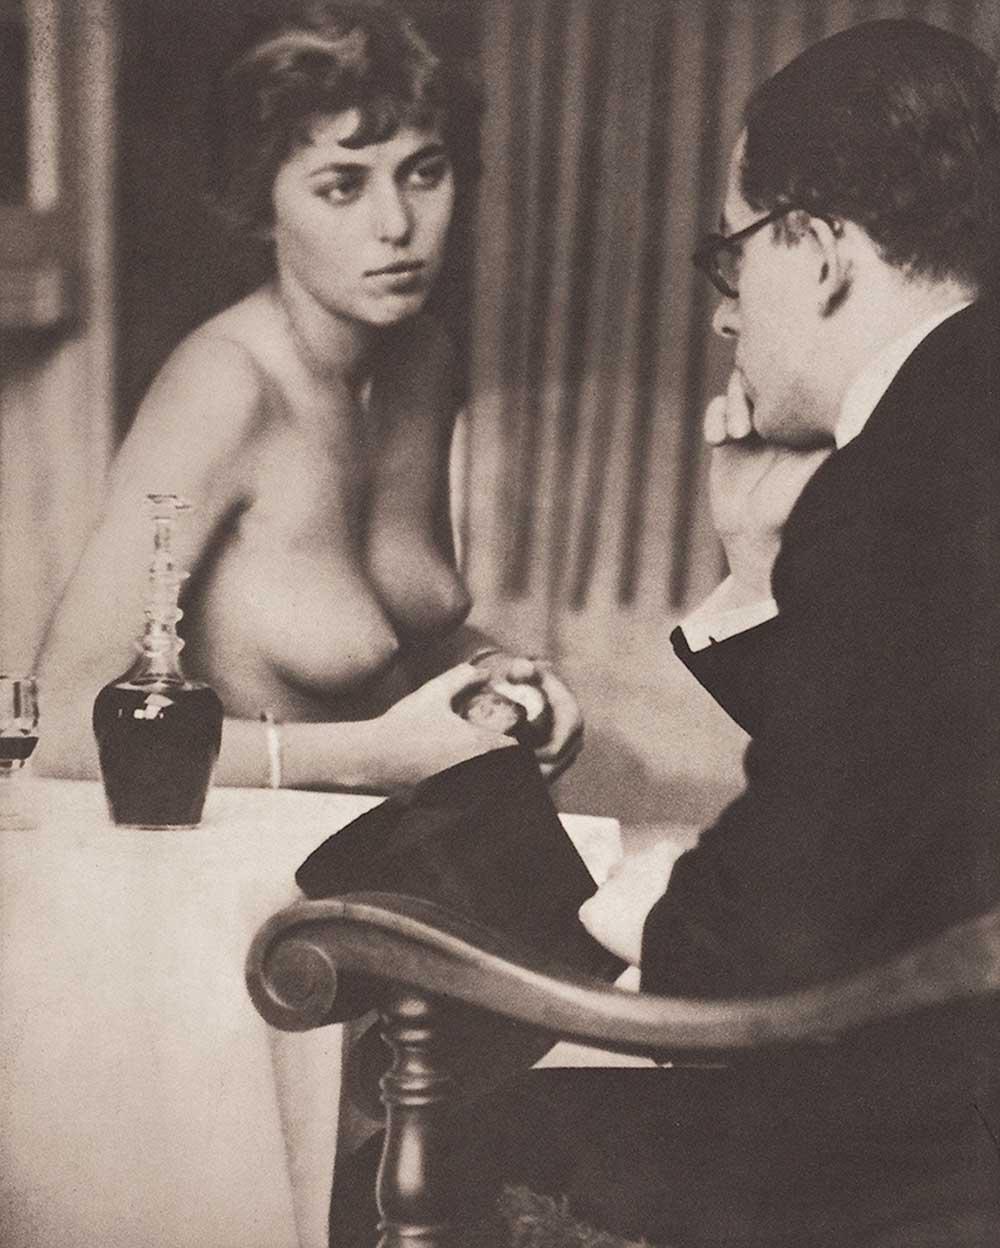 Josef Breitenbach.Dr. Riegler and J. Greno - Munich,1933 Photogravure on wove paper